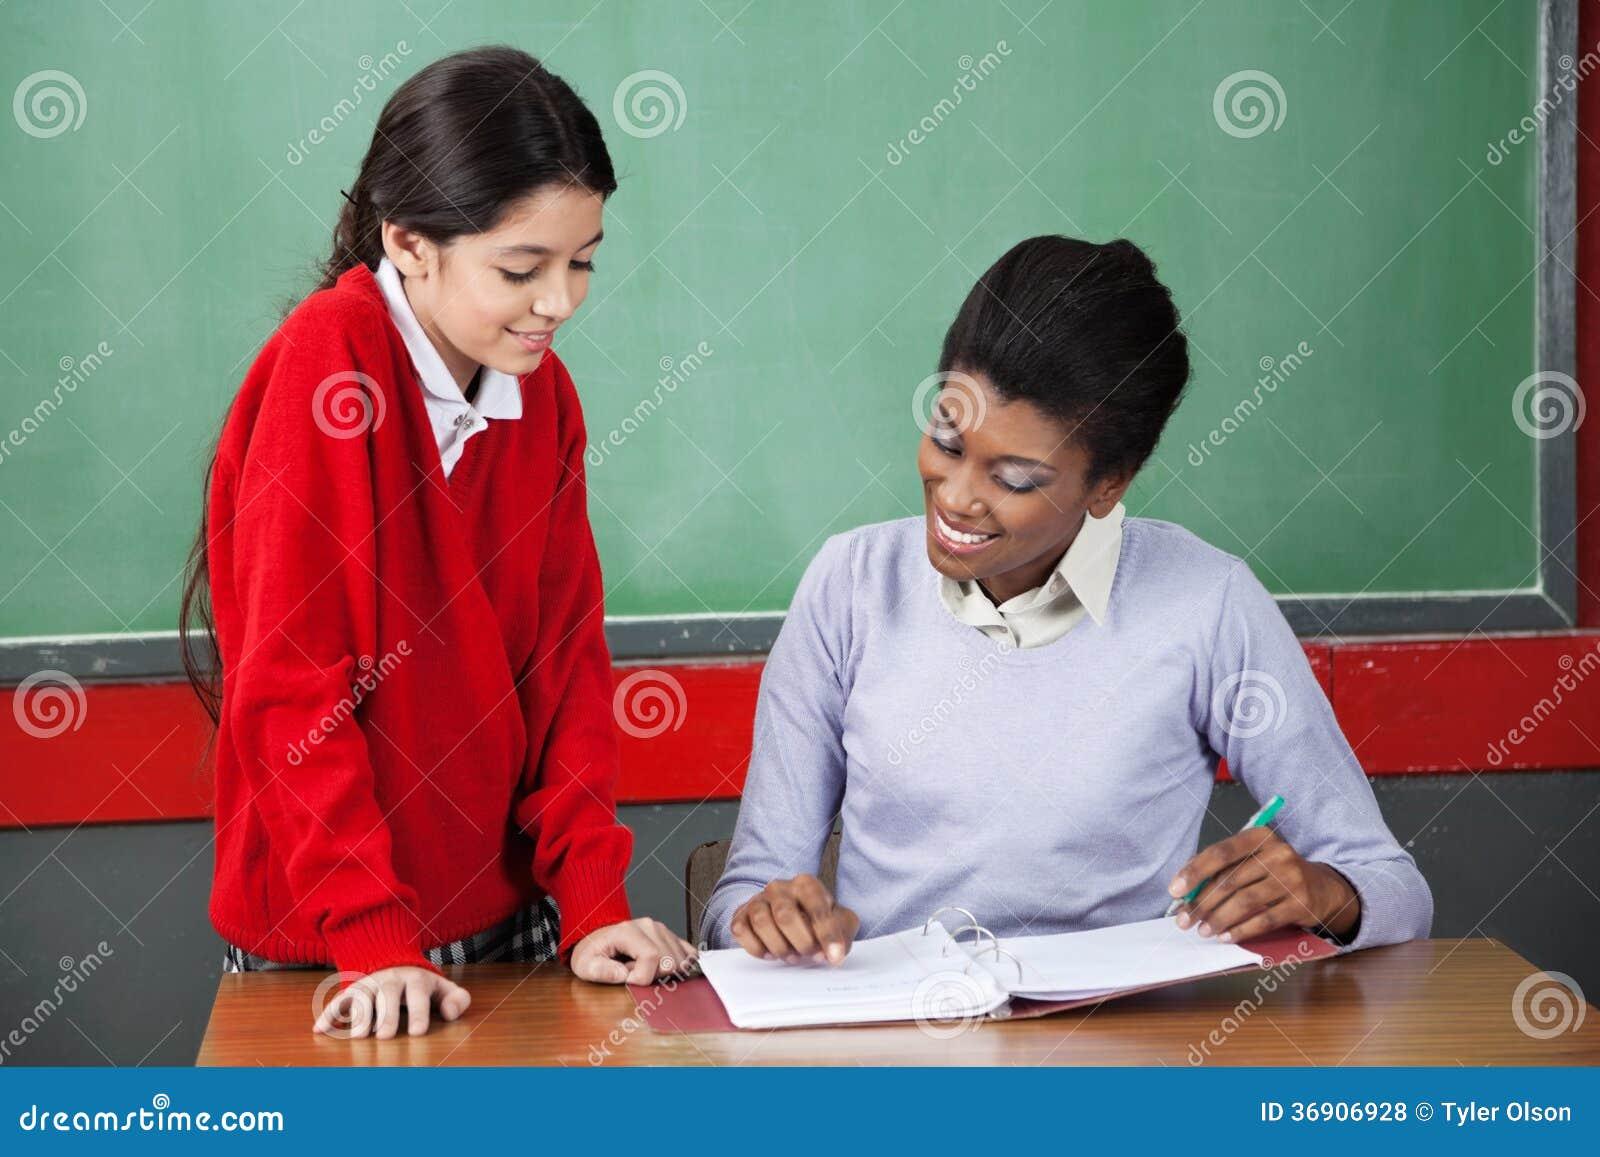 Download Teacher Teaching Schoolgirl At Desk Stock Photo Image Of Primary Desk 36906928